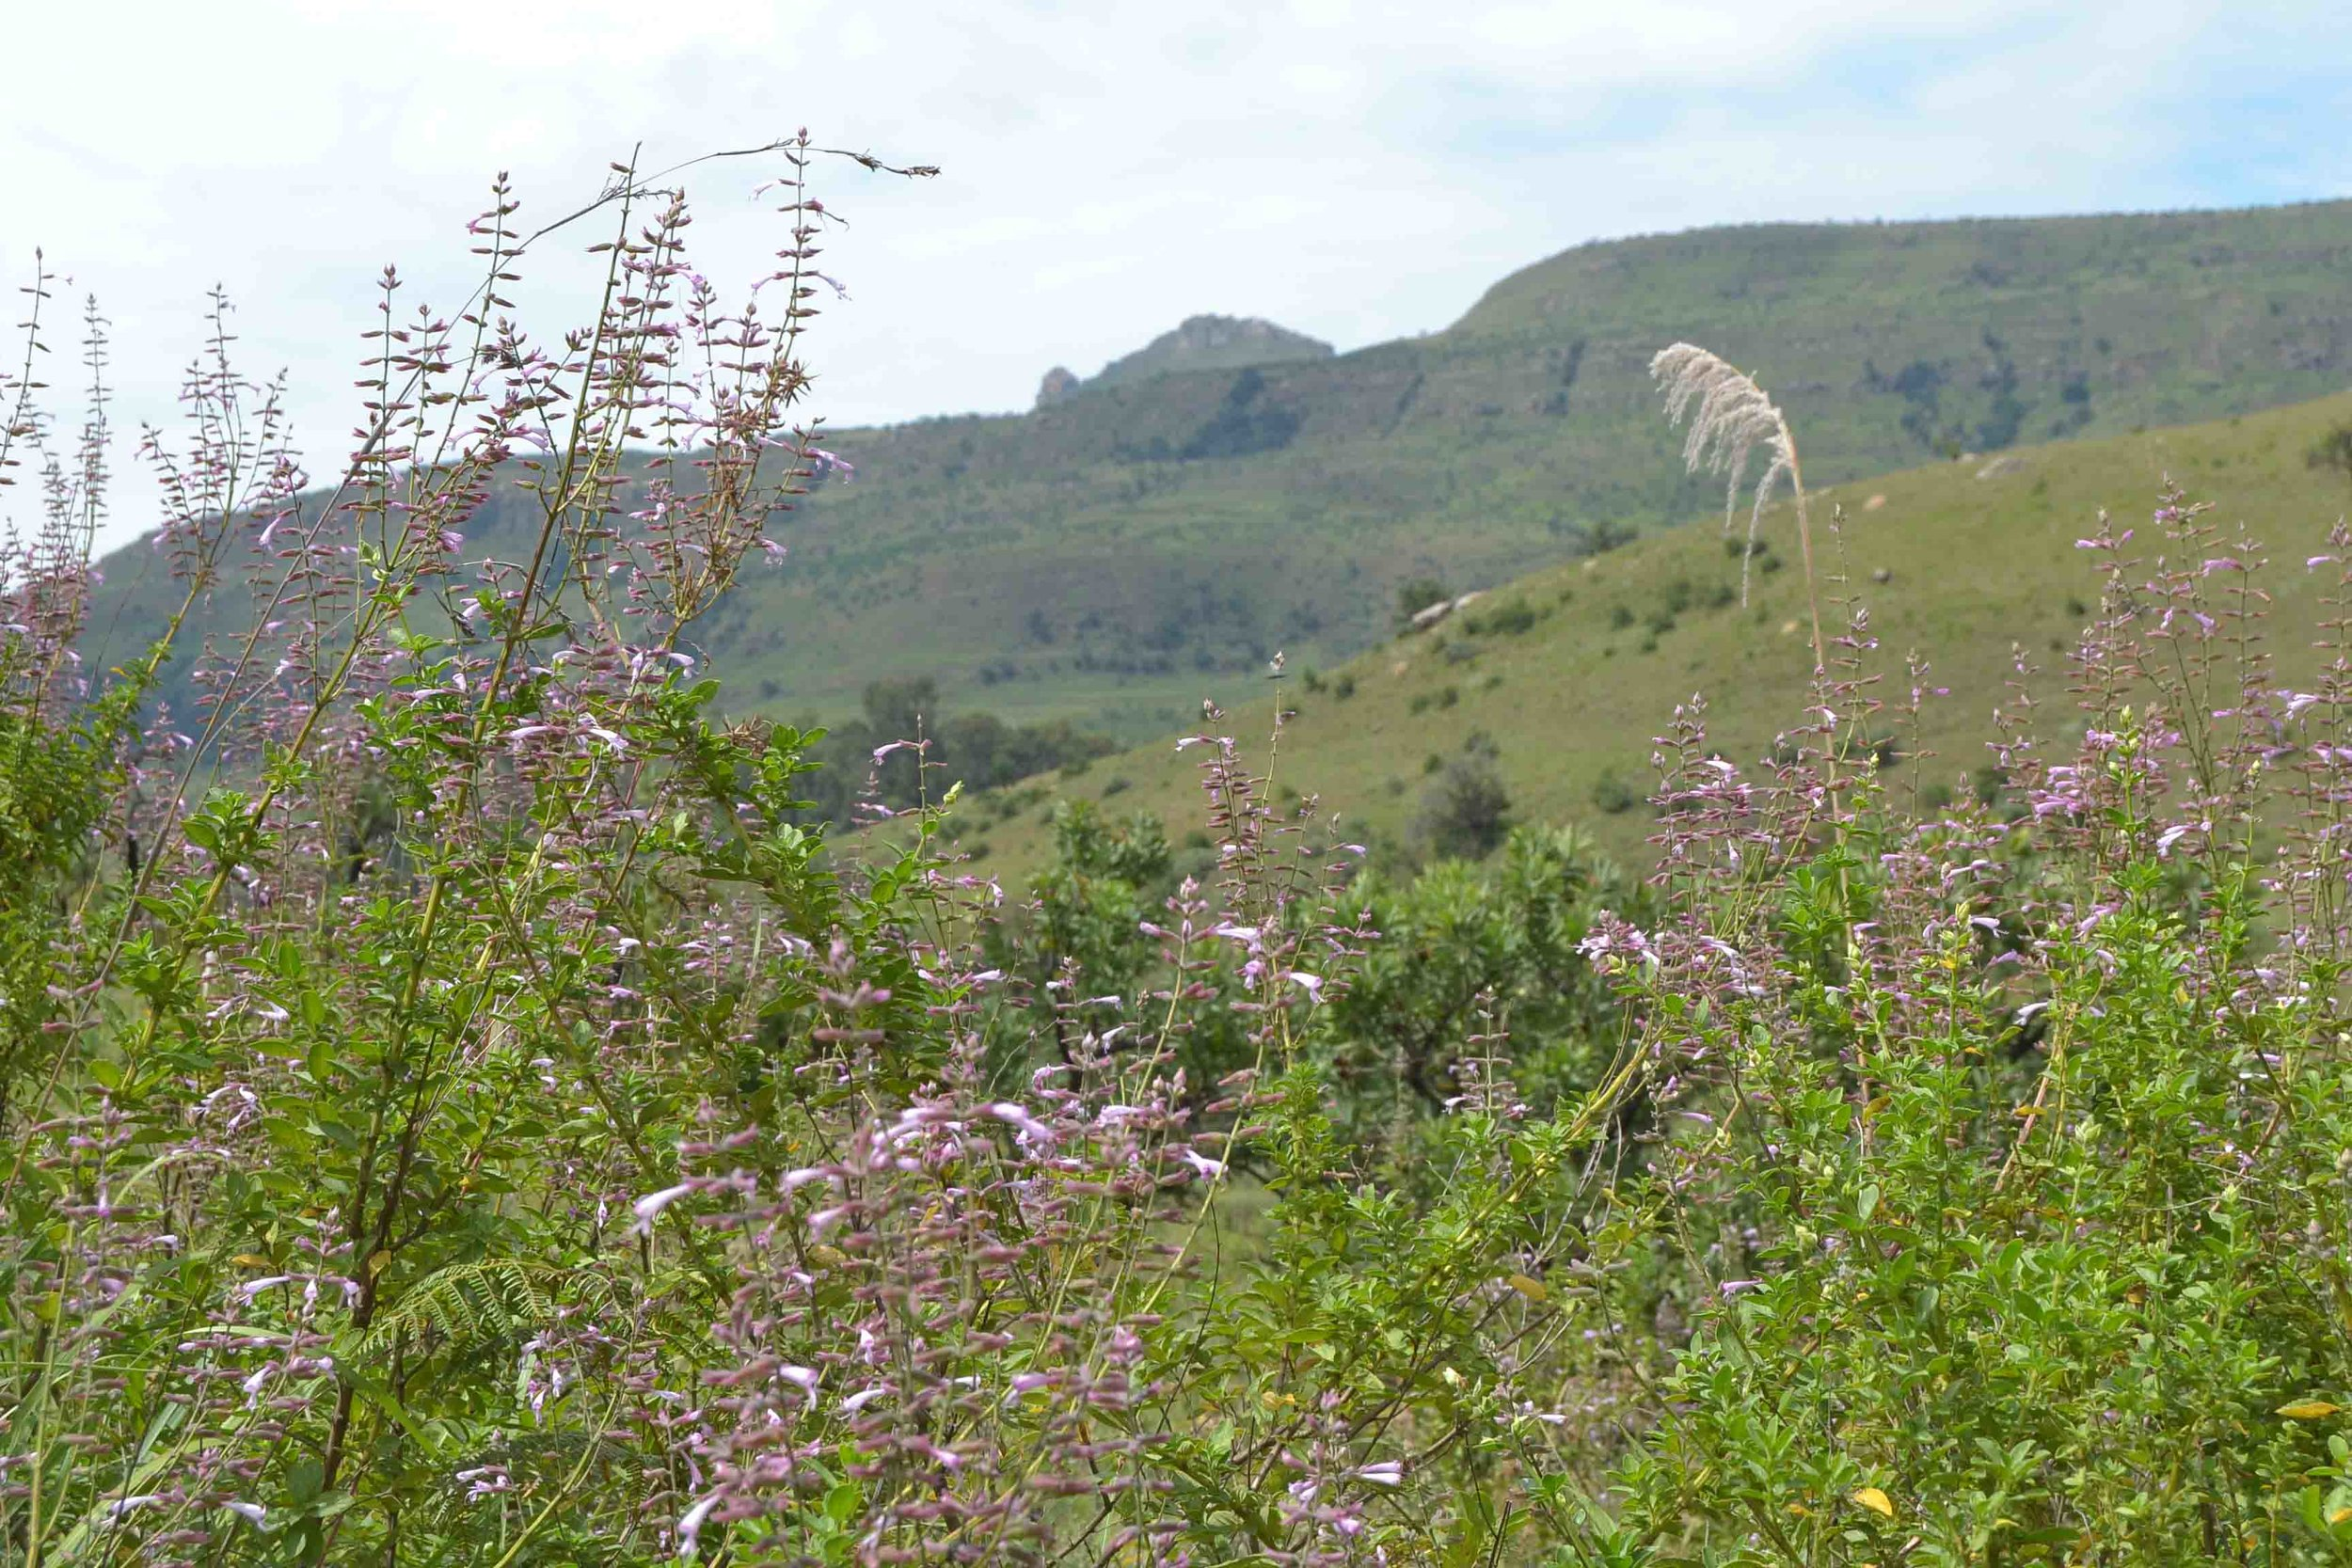 Syncolostemon macratnhus  - tall purple pink flowering shrub